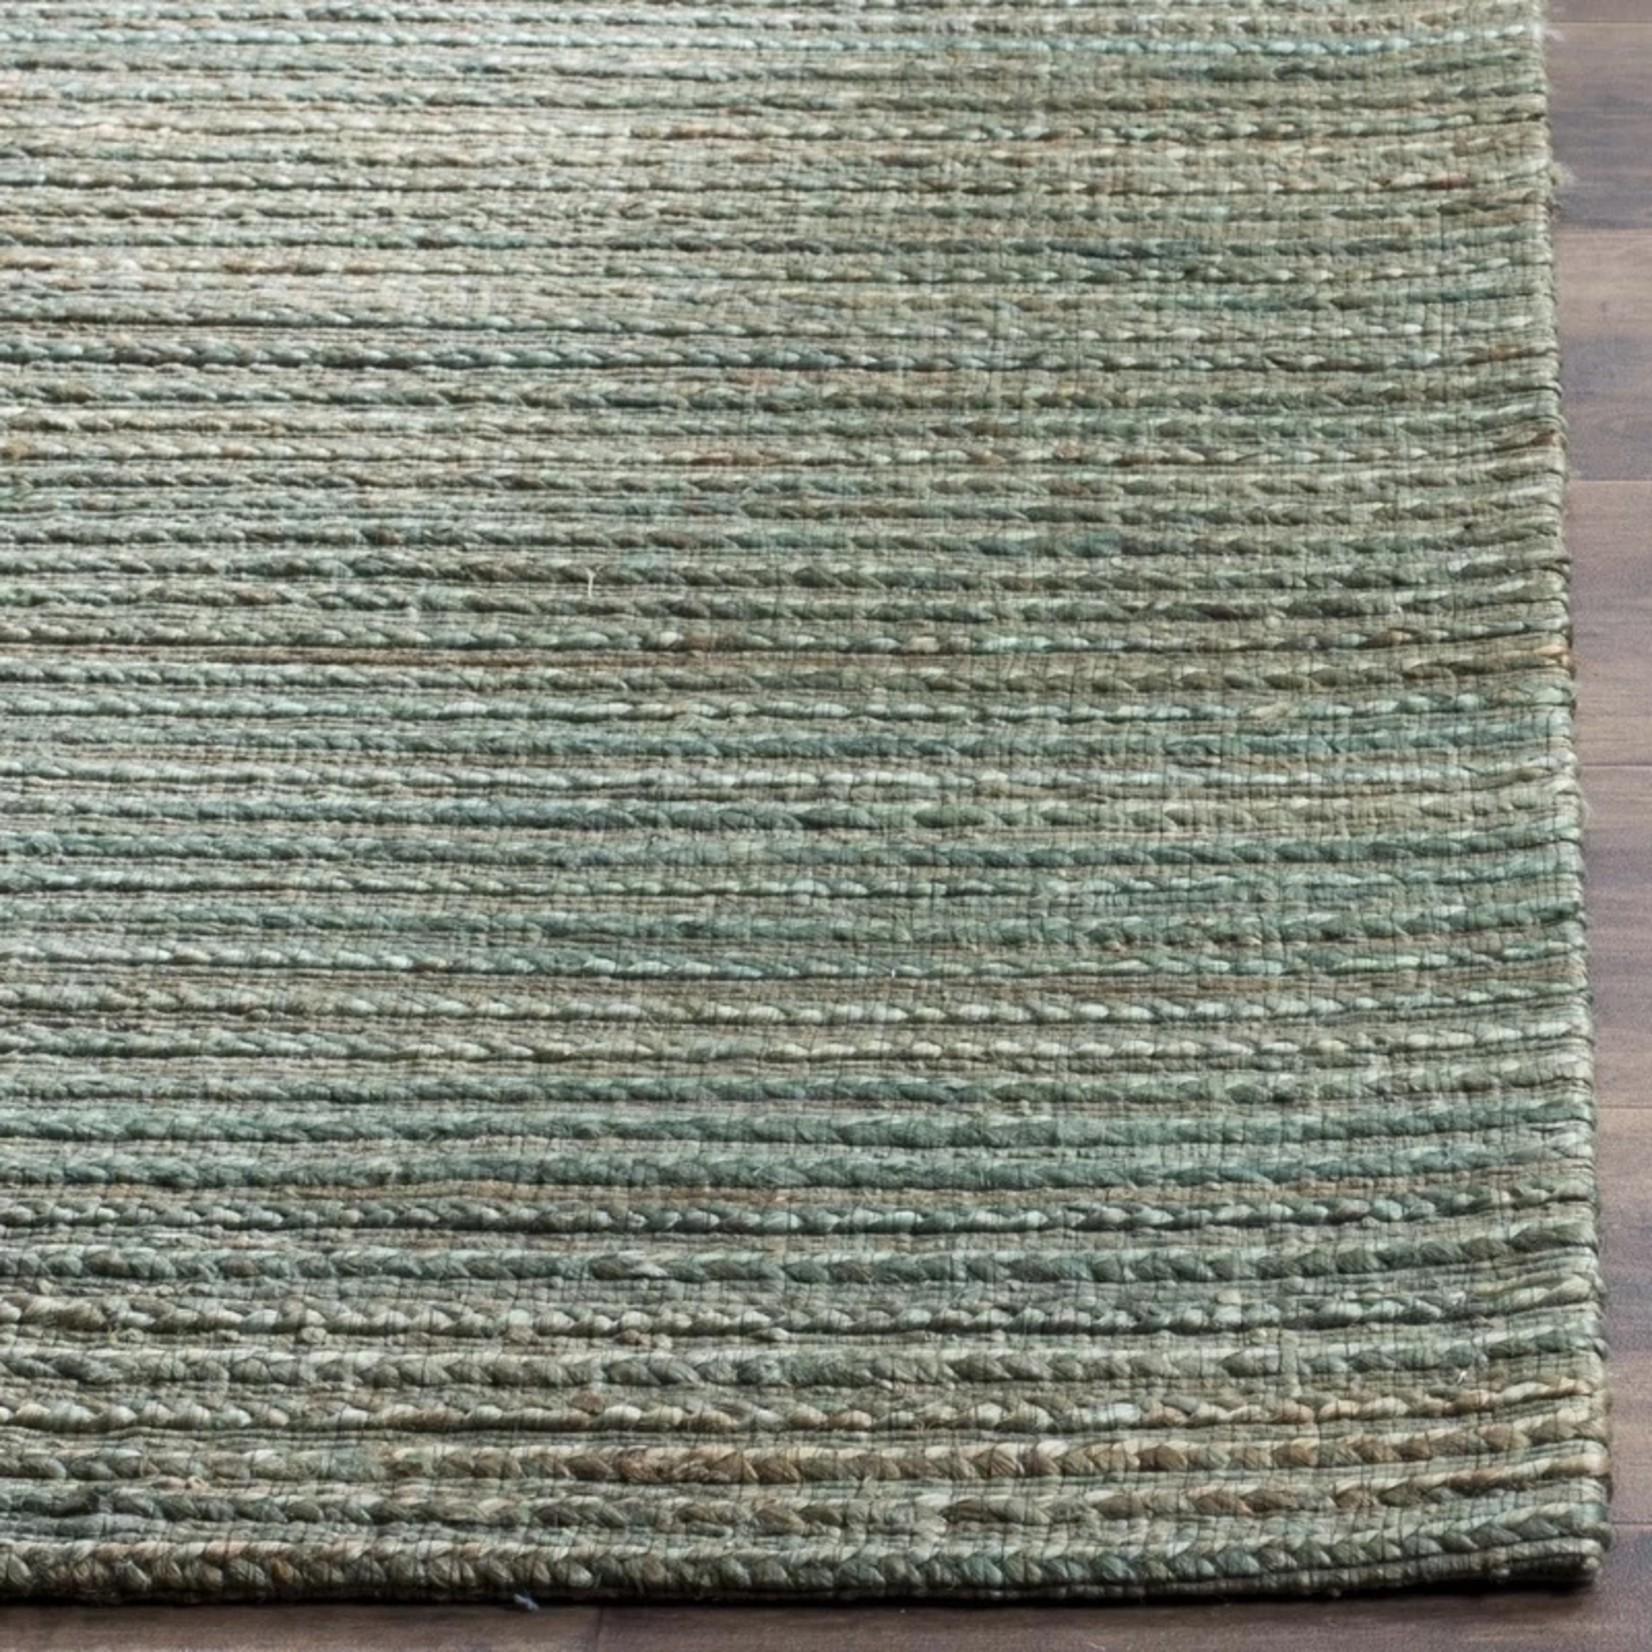 *5' x 8' - Abia Handmade Flatweave Sage/Natural  Area Rug